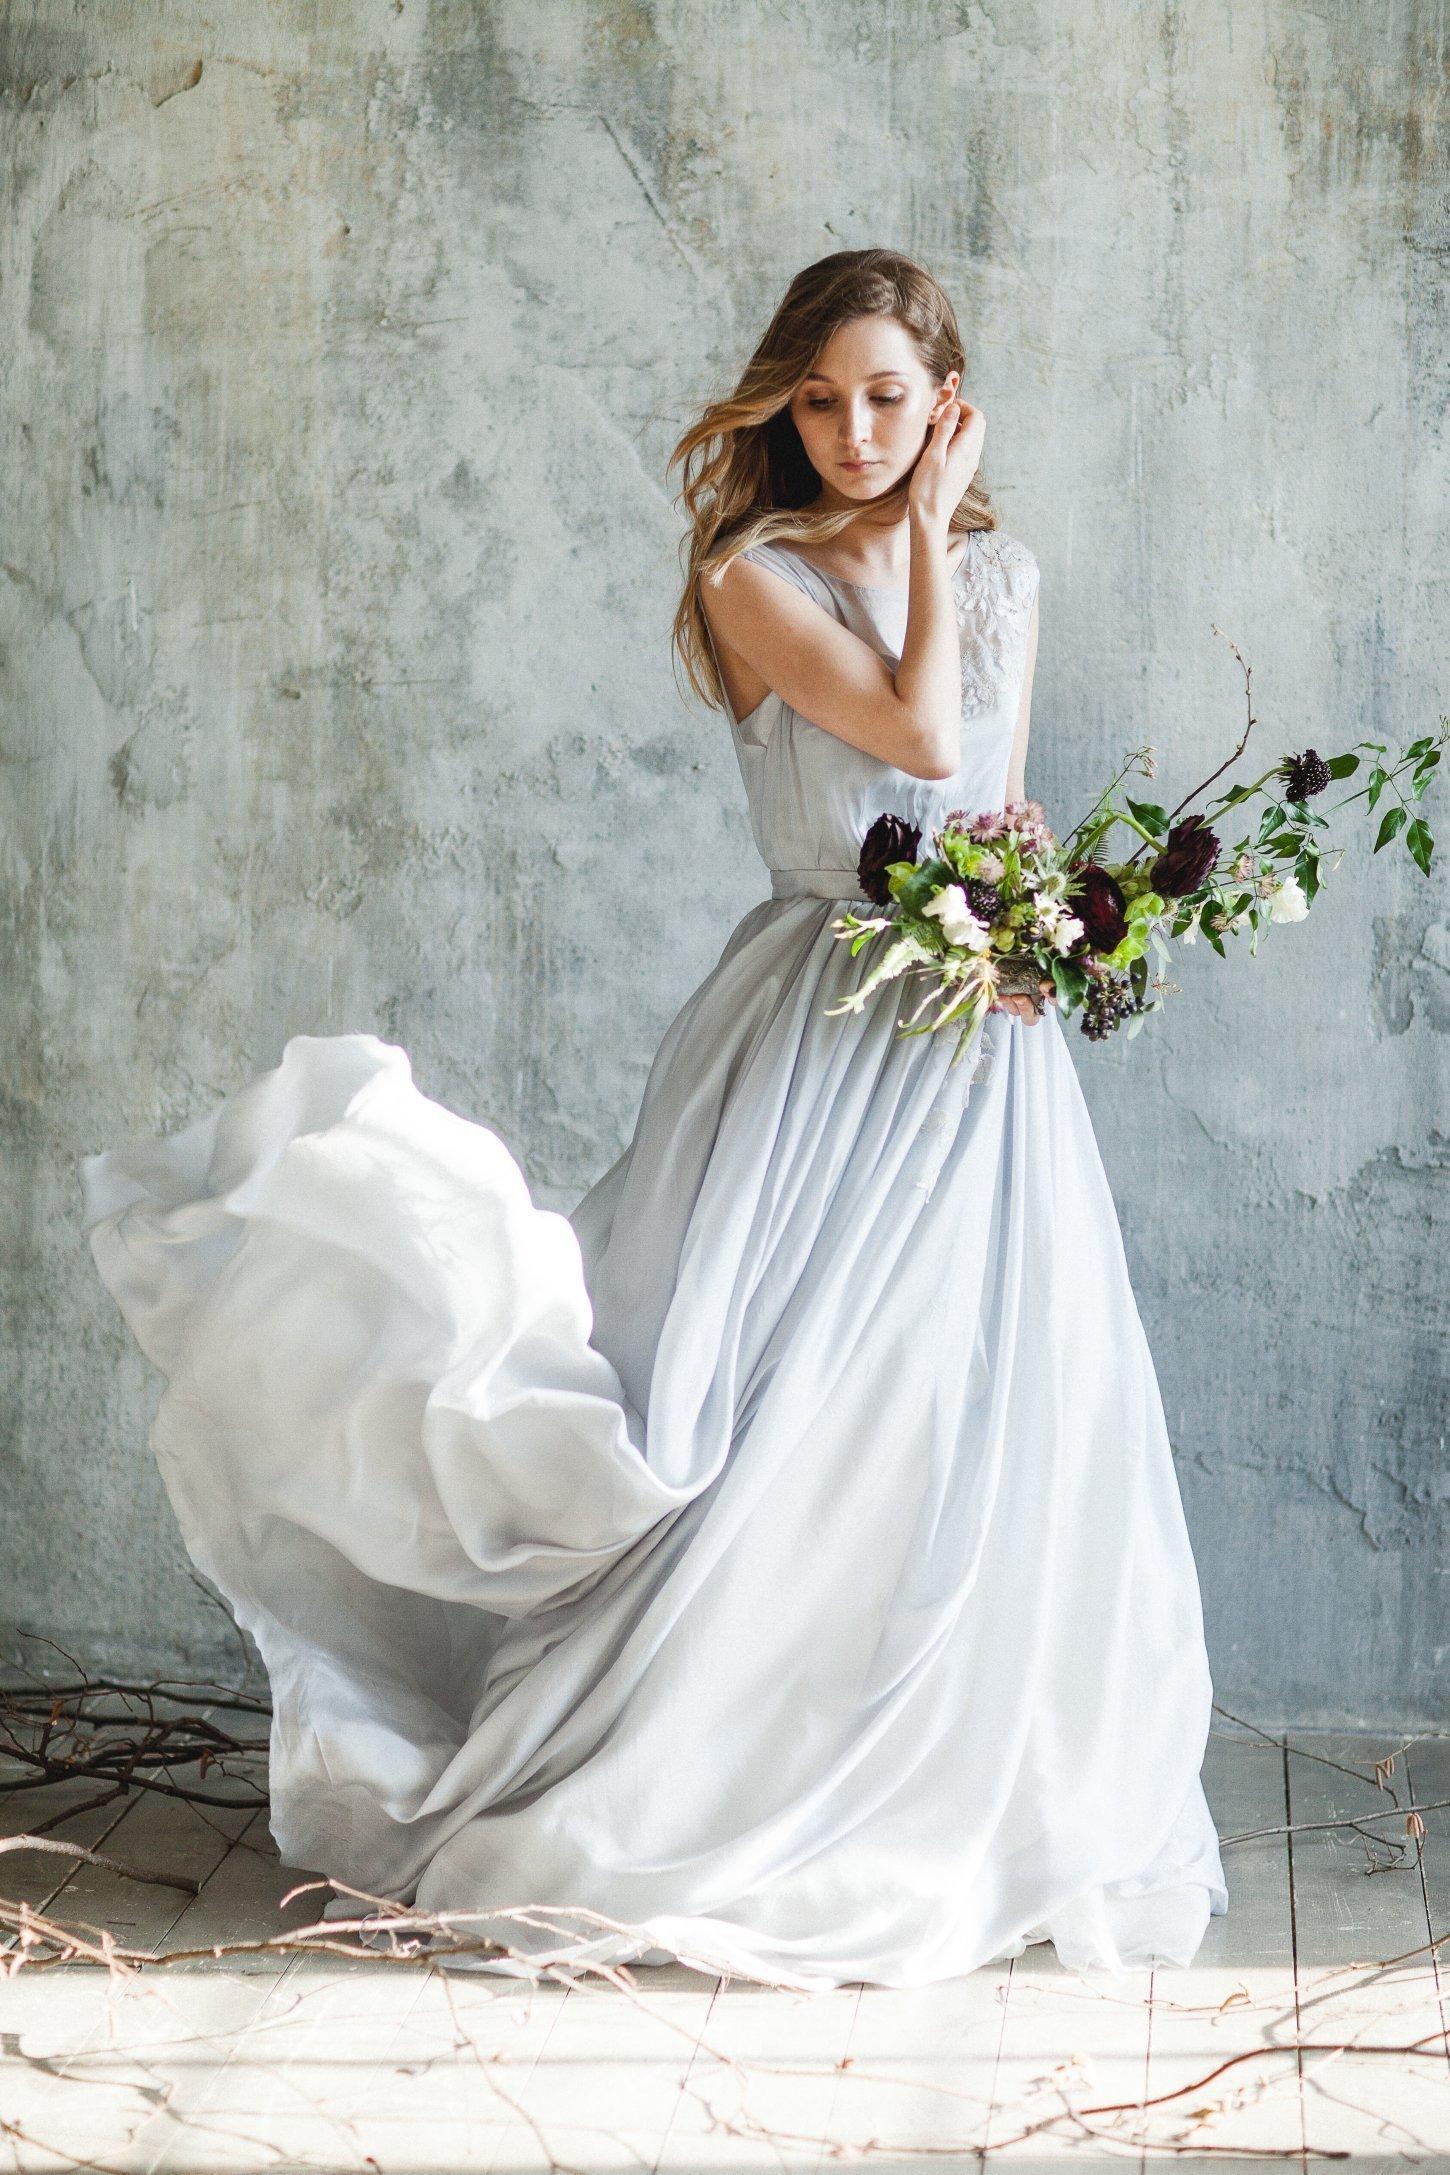 Grey Wedding Dress.Blue Grey Illusion Neckline Wedding Dress With Sleeveless Bodice